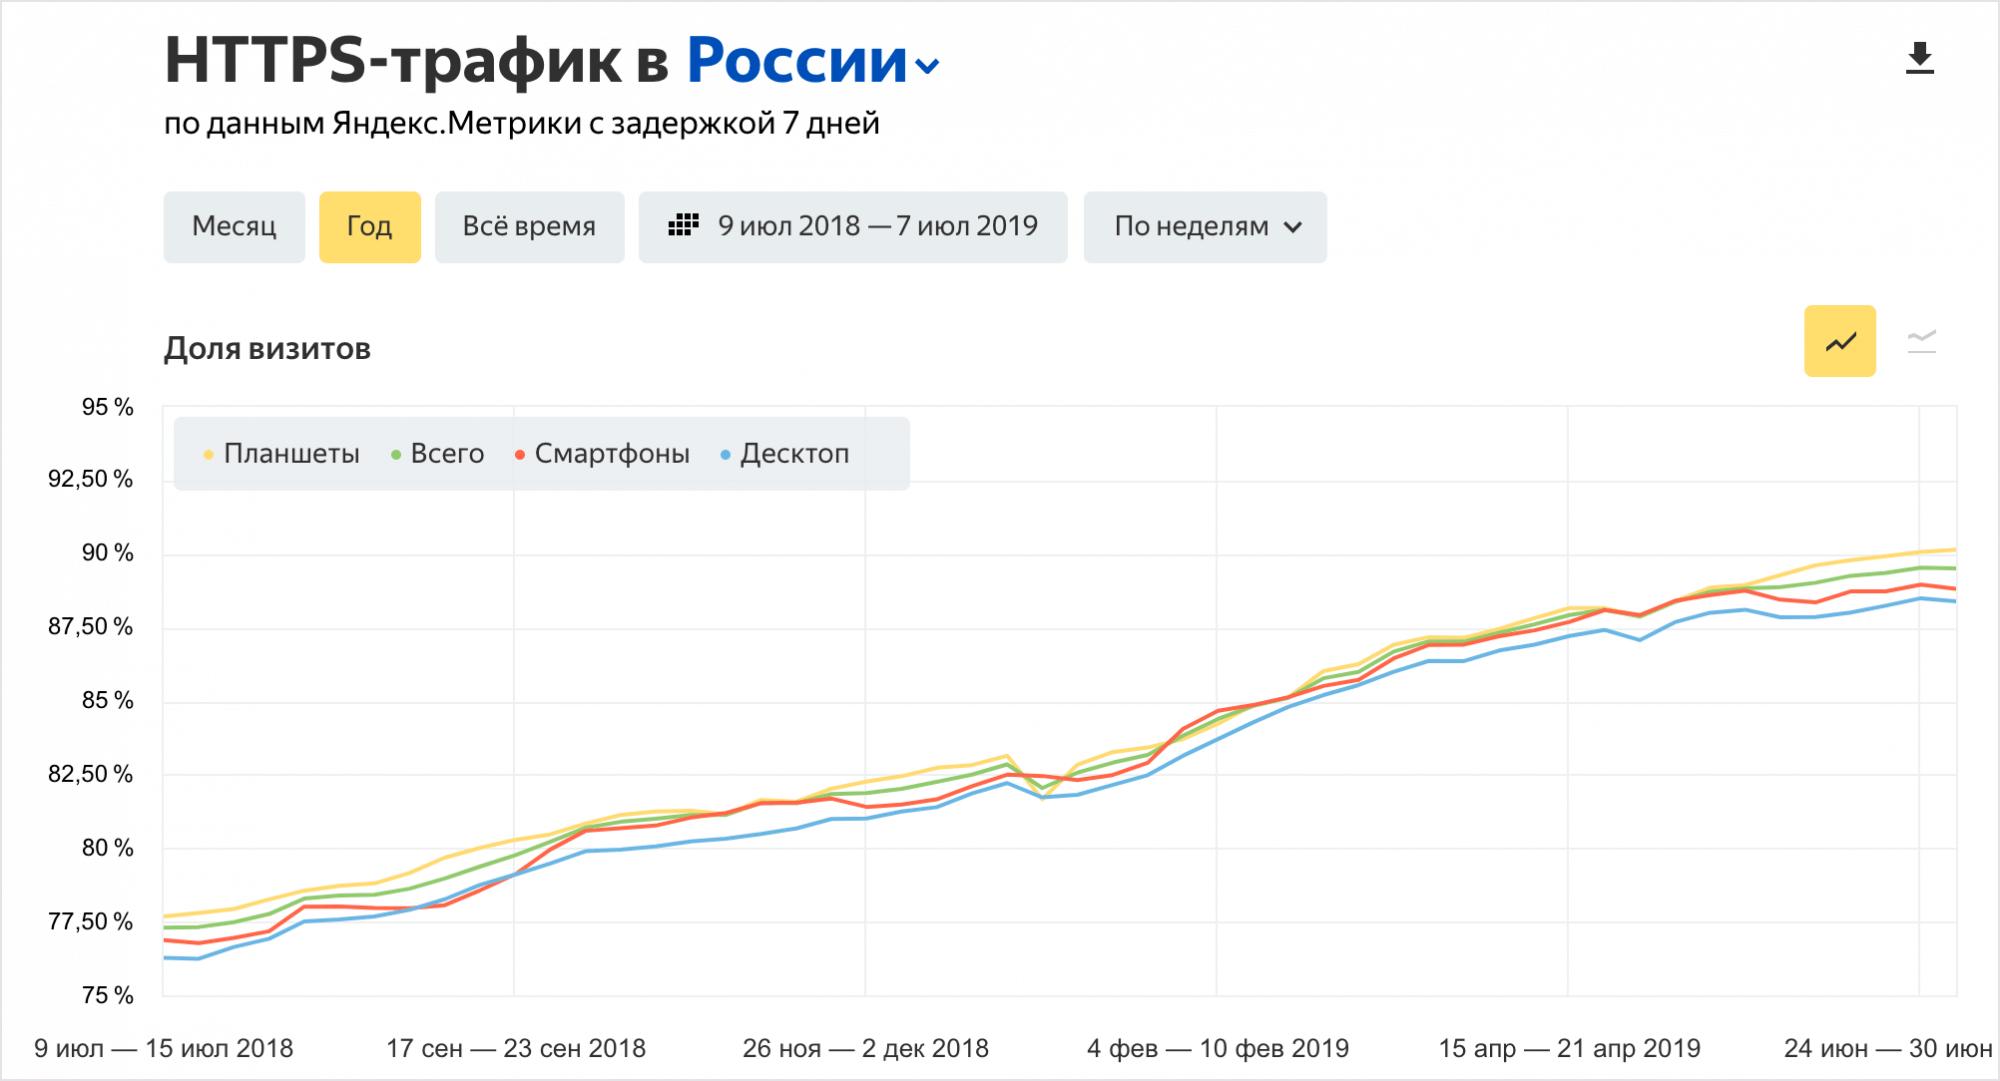 Яндекс.Радар добавил отчет с долей HTTPS-трафика